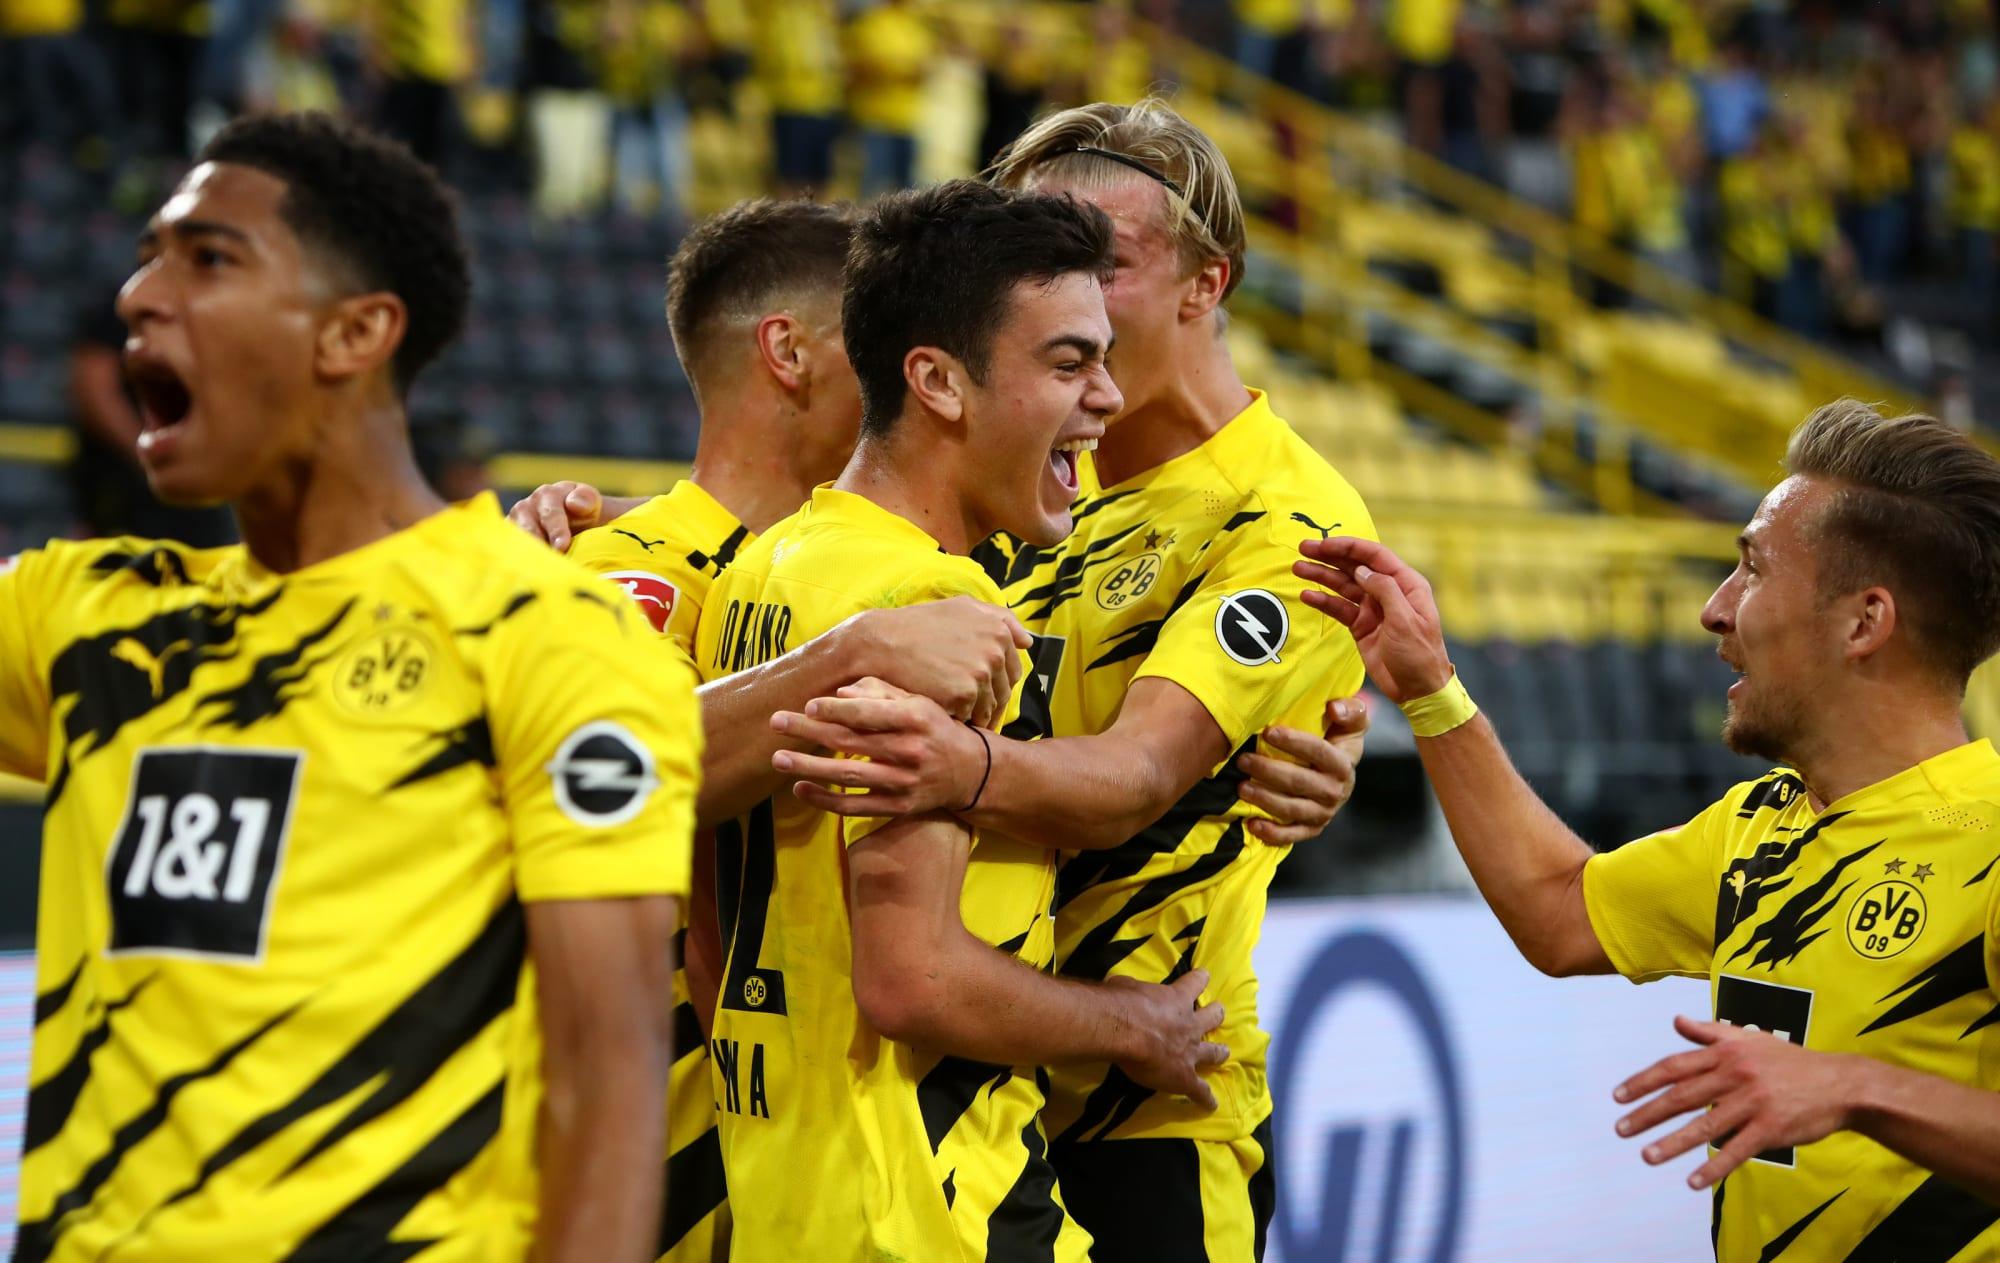 Bundesliga roundup: Title rivals Bayern Munich, Borussia Dortmund win big on opening weekend